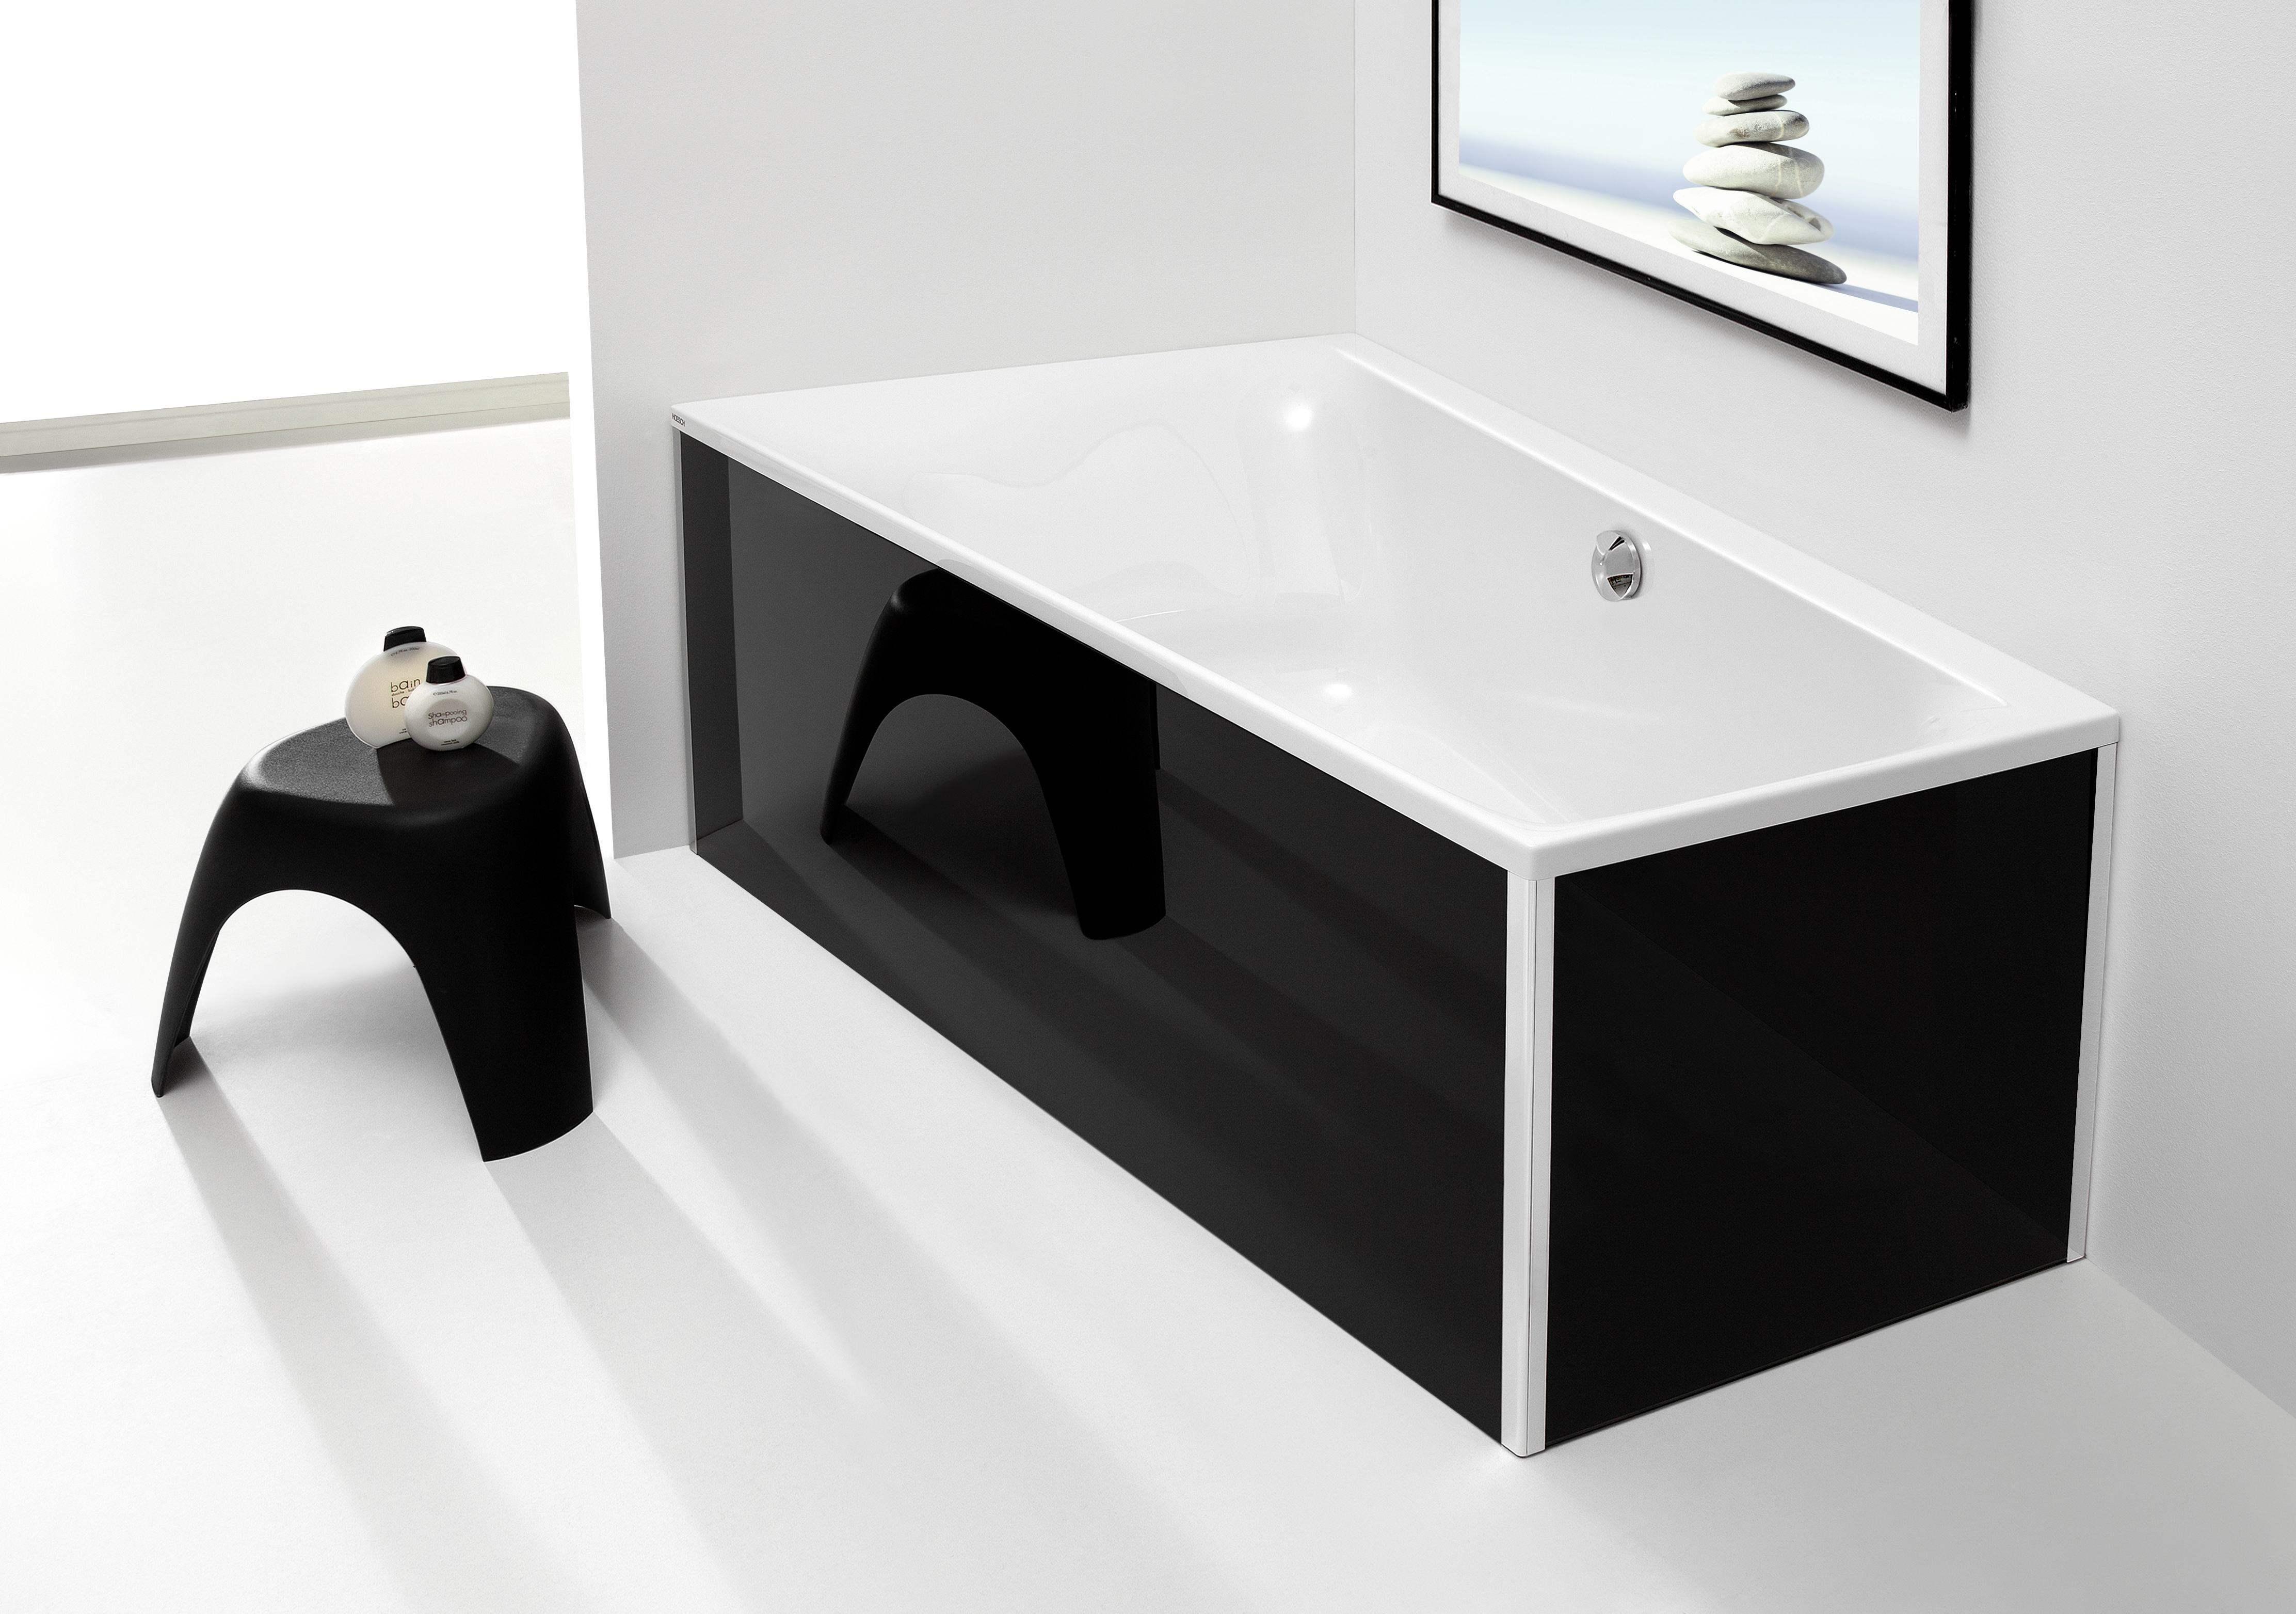 hoesch thasos glasverkleidung eckvariante f r badewanne. Black Bedroom Furniture Sets. Home Design Ideas